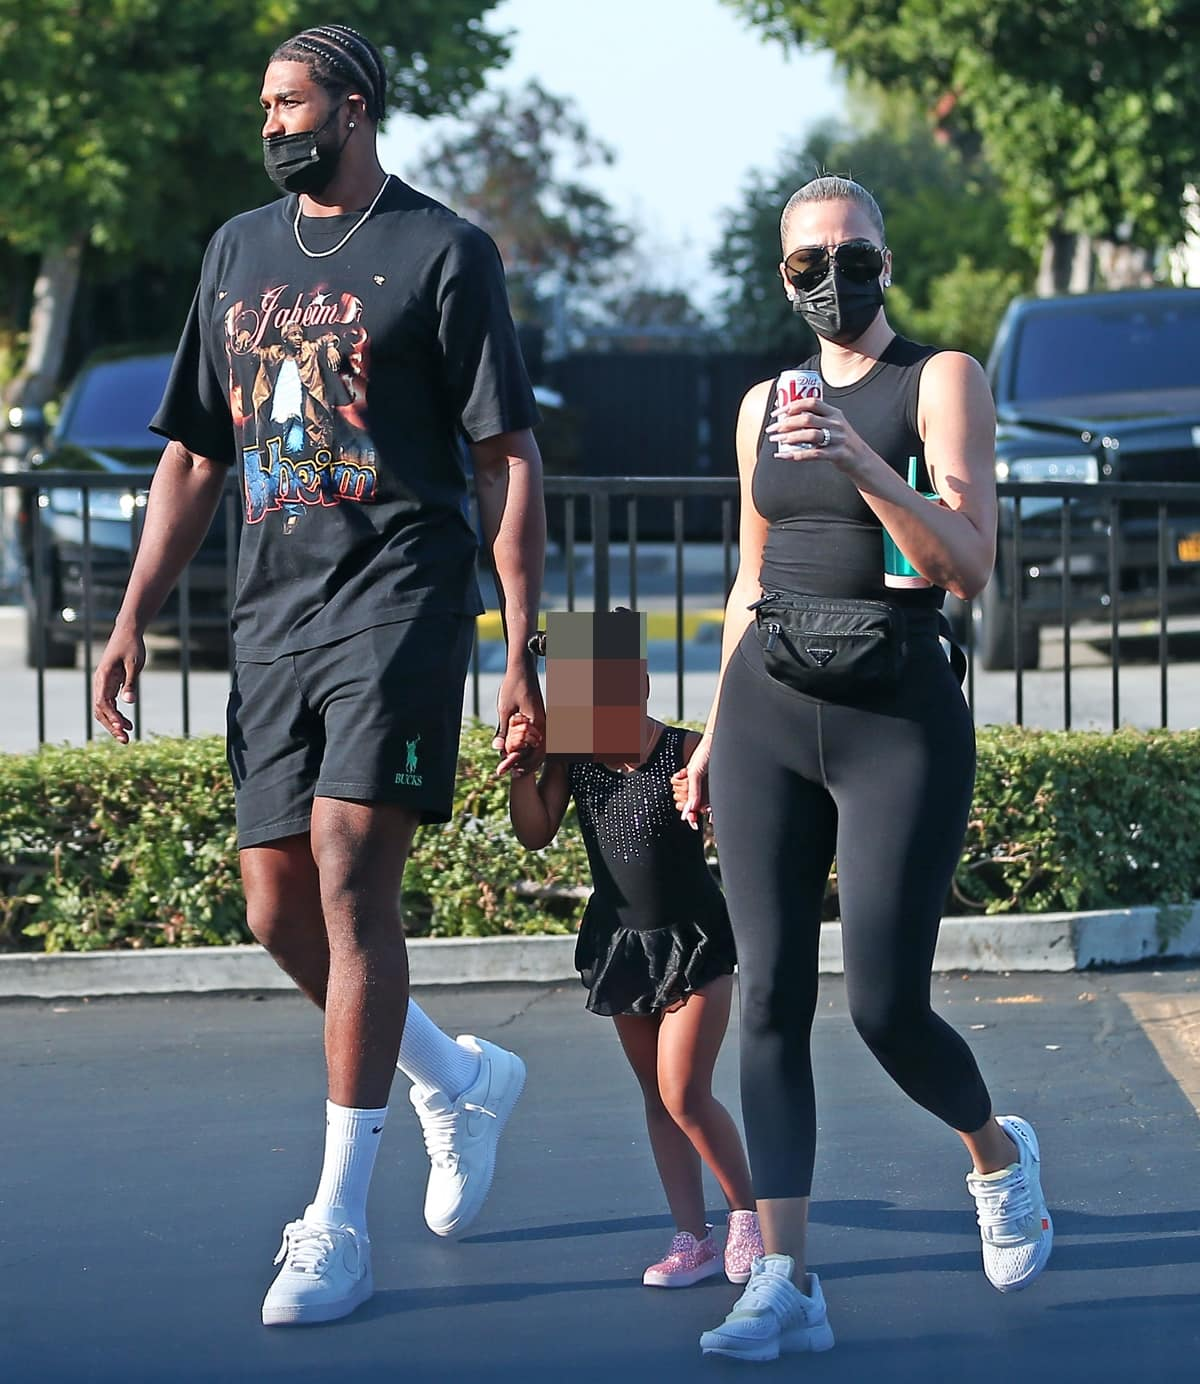 Khloe Kardashian Tristan Thompson are co-parenting their daughter True